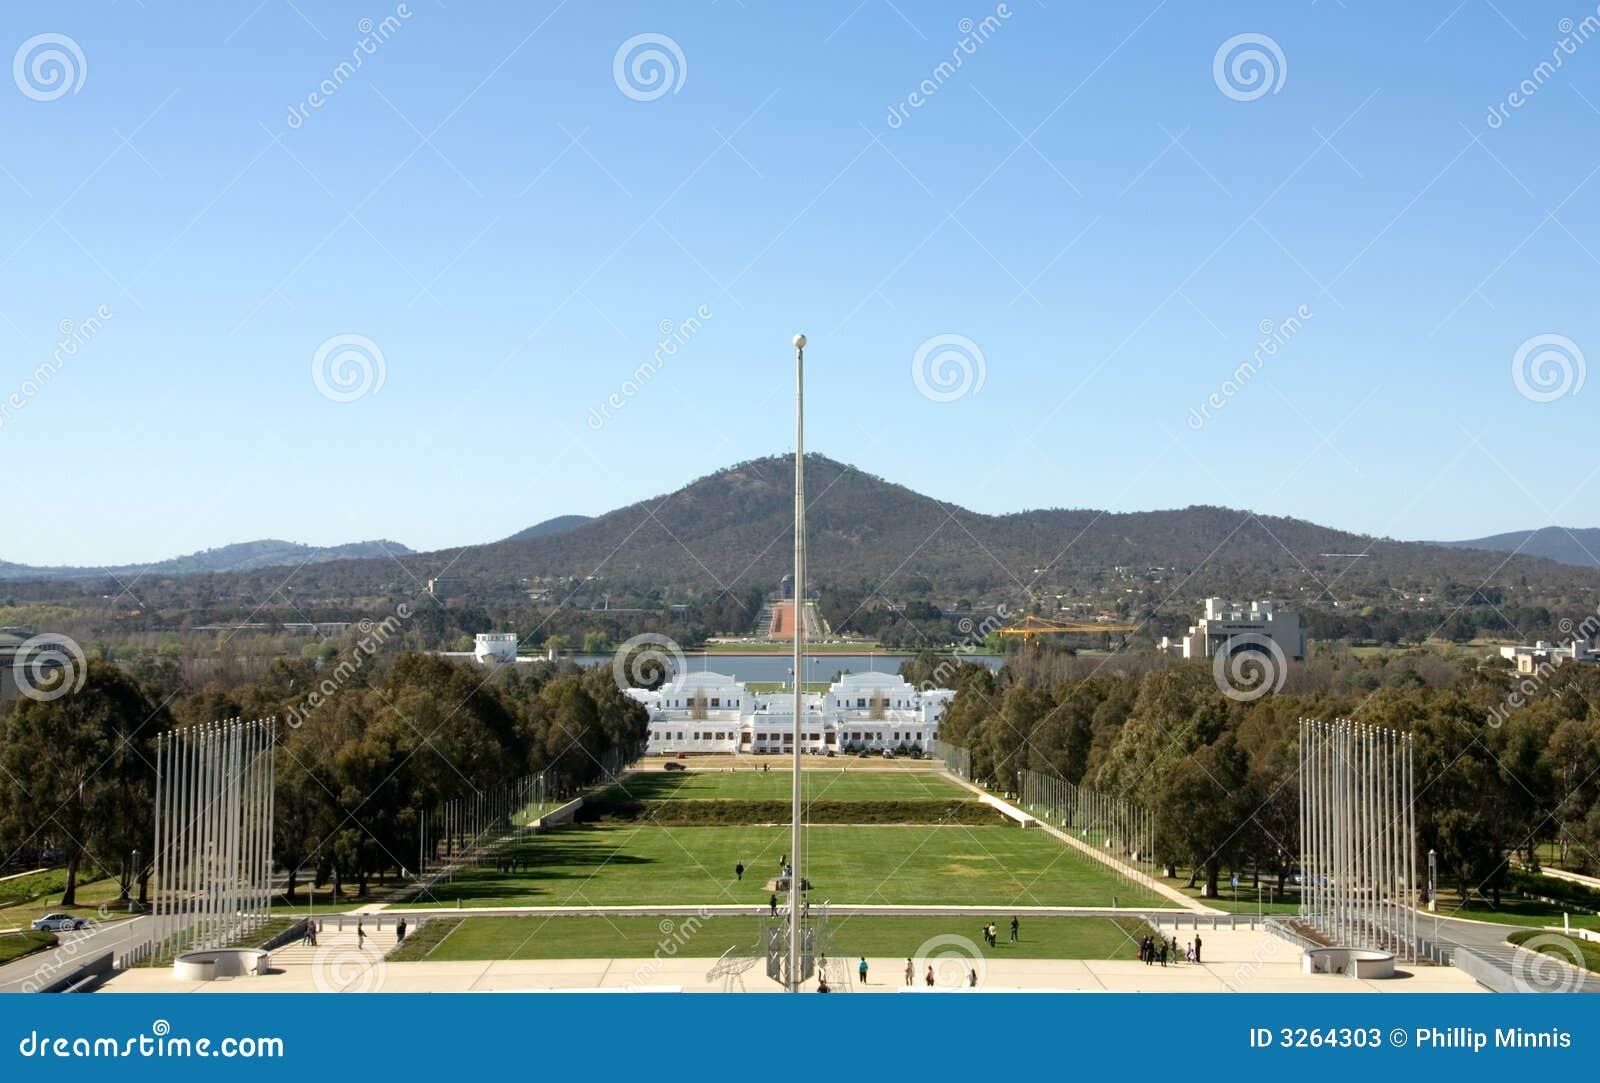 Web Designers In Canberra